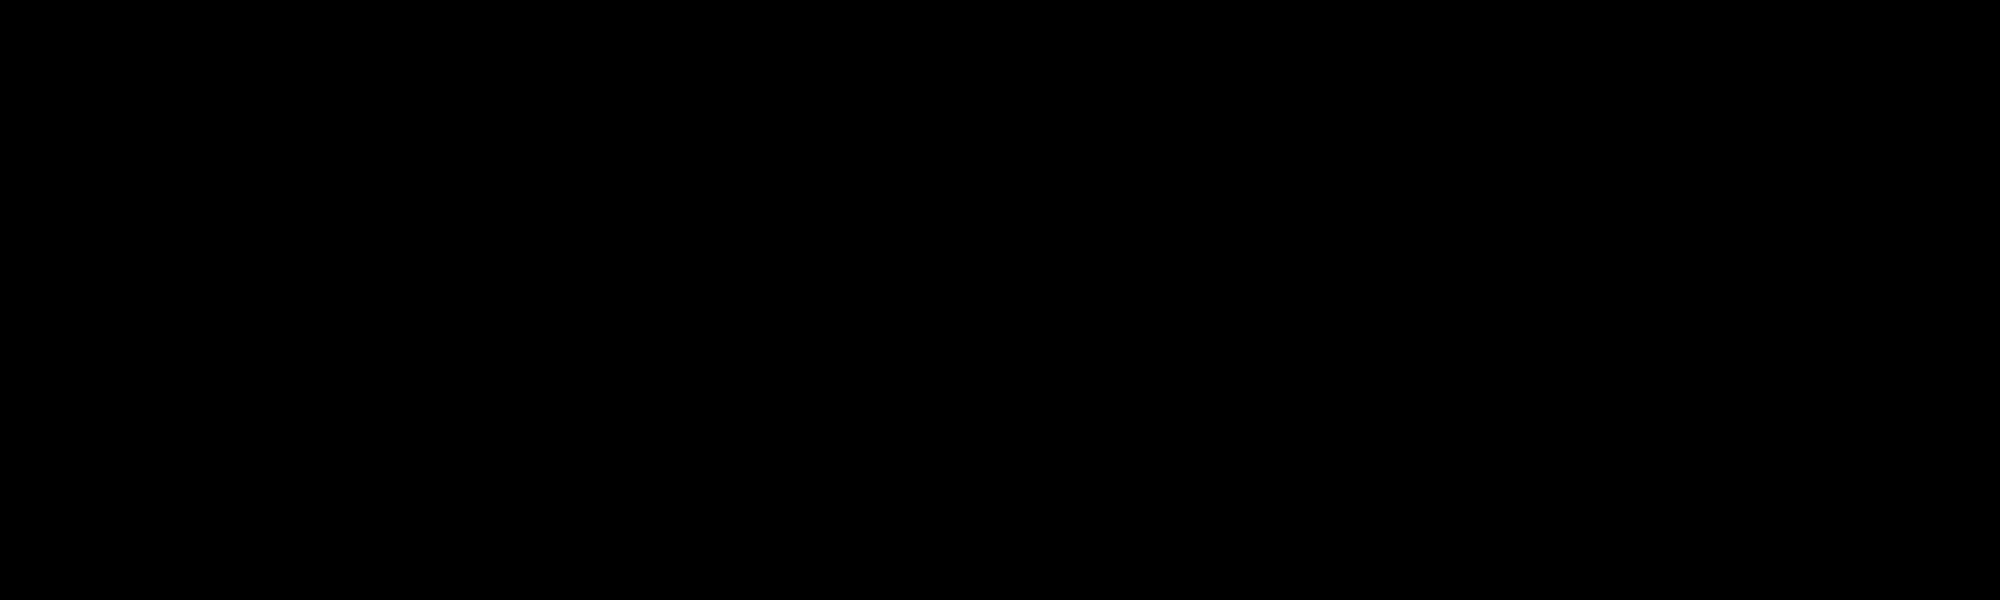 SEMLER_black_RGB